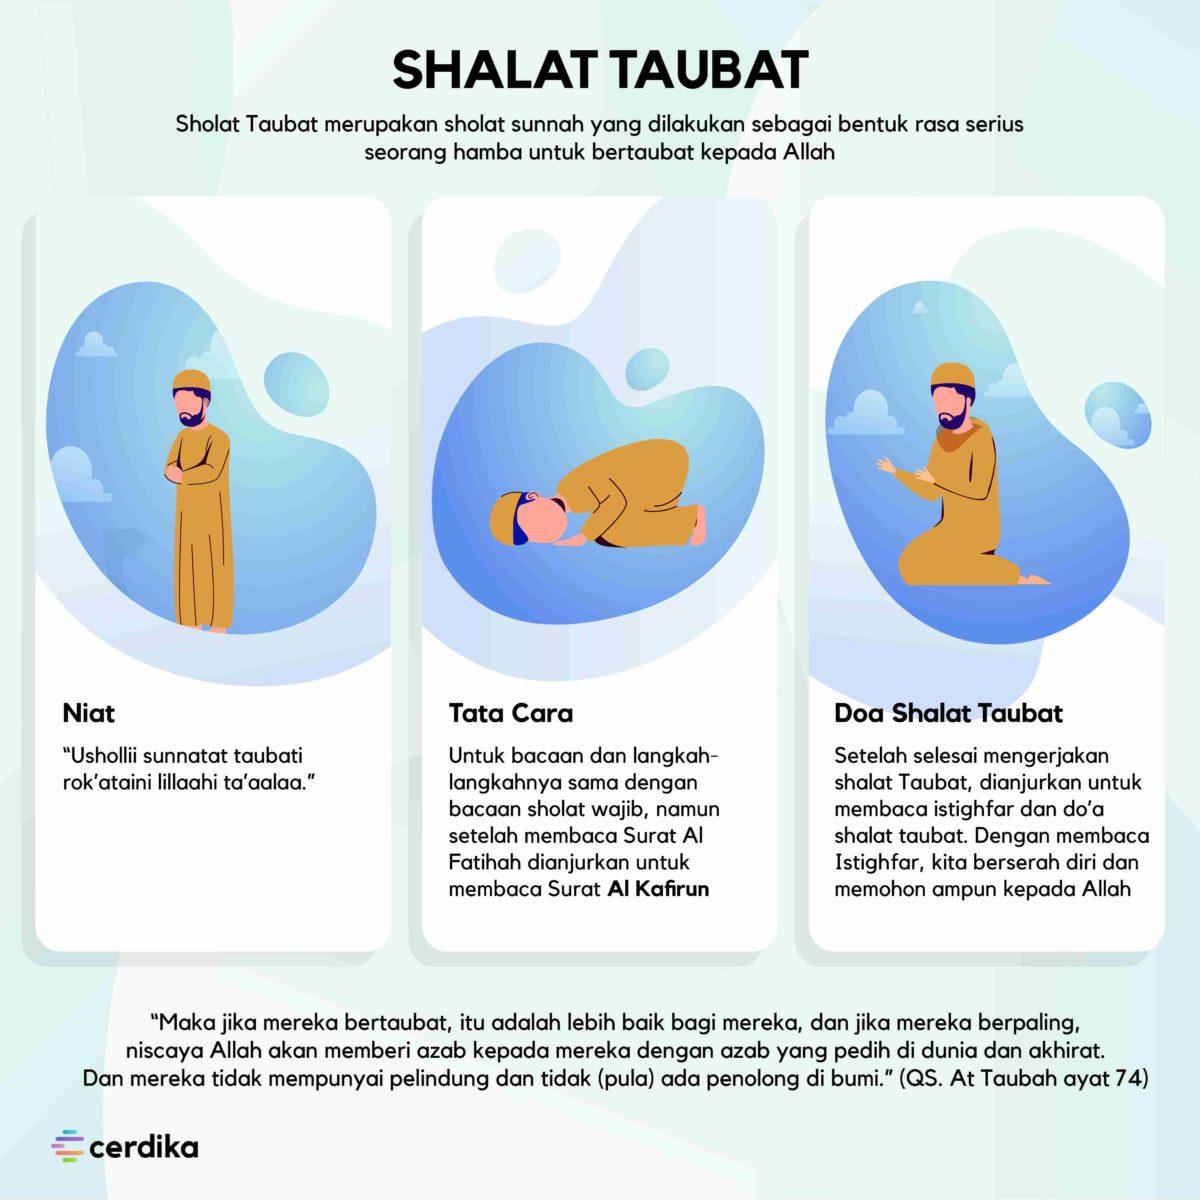 35+ Tata Cara Sholat Taubat Pictures - Andromopedia